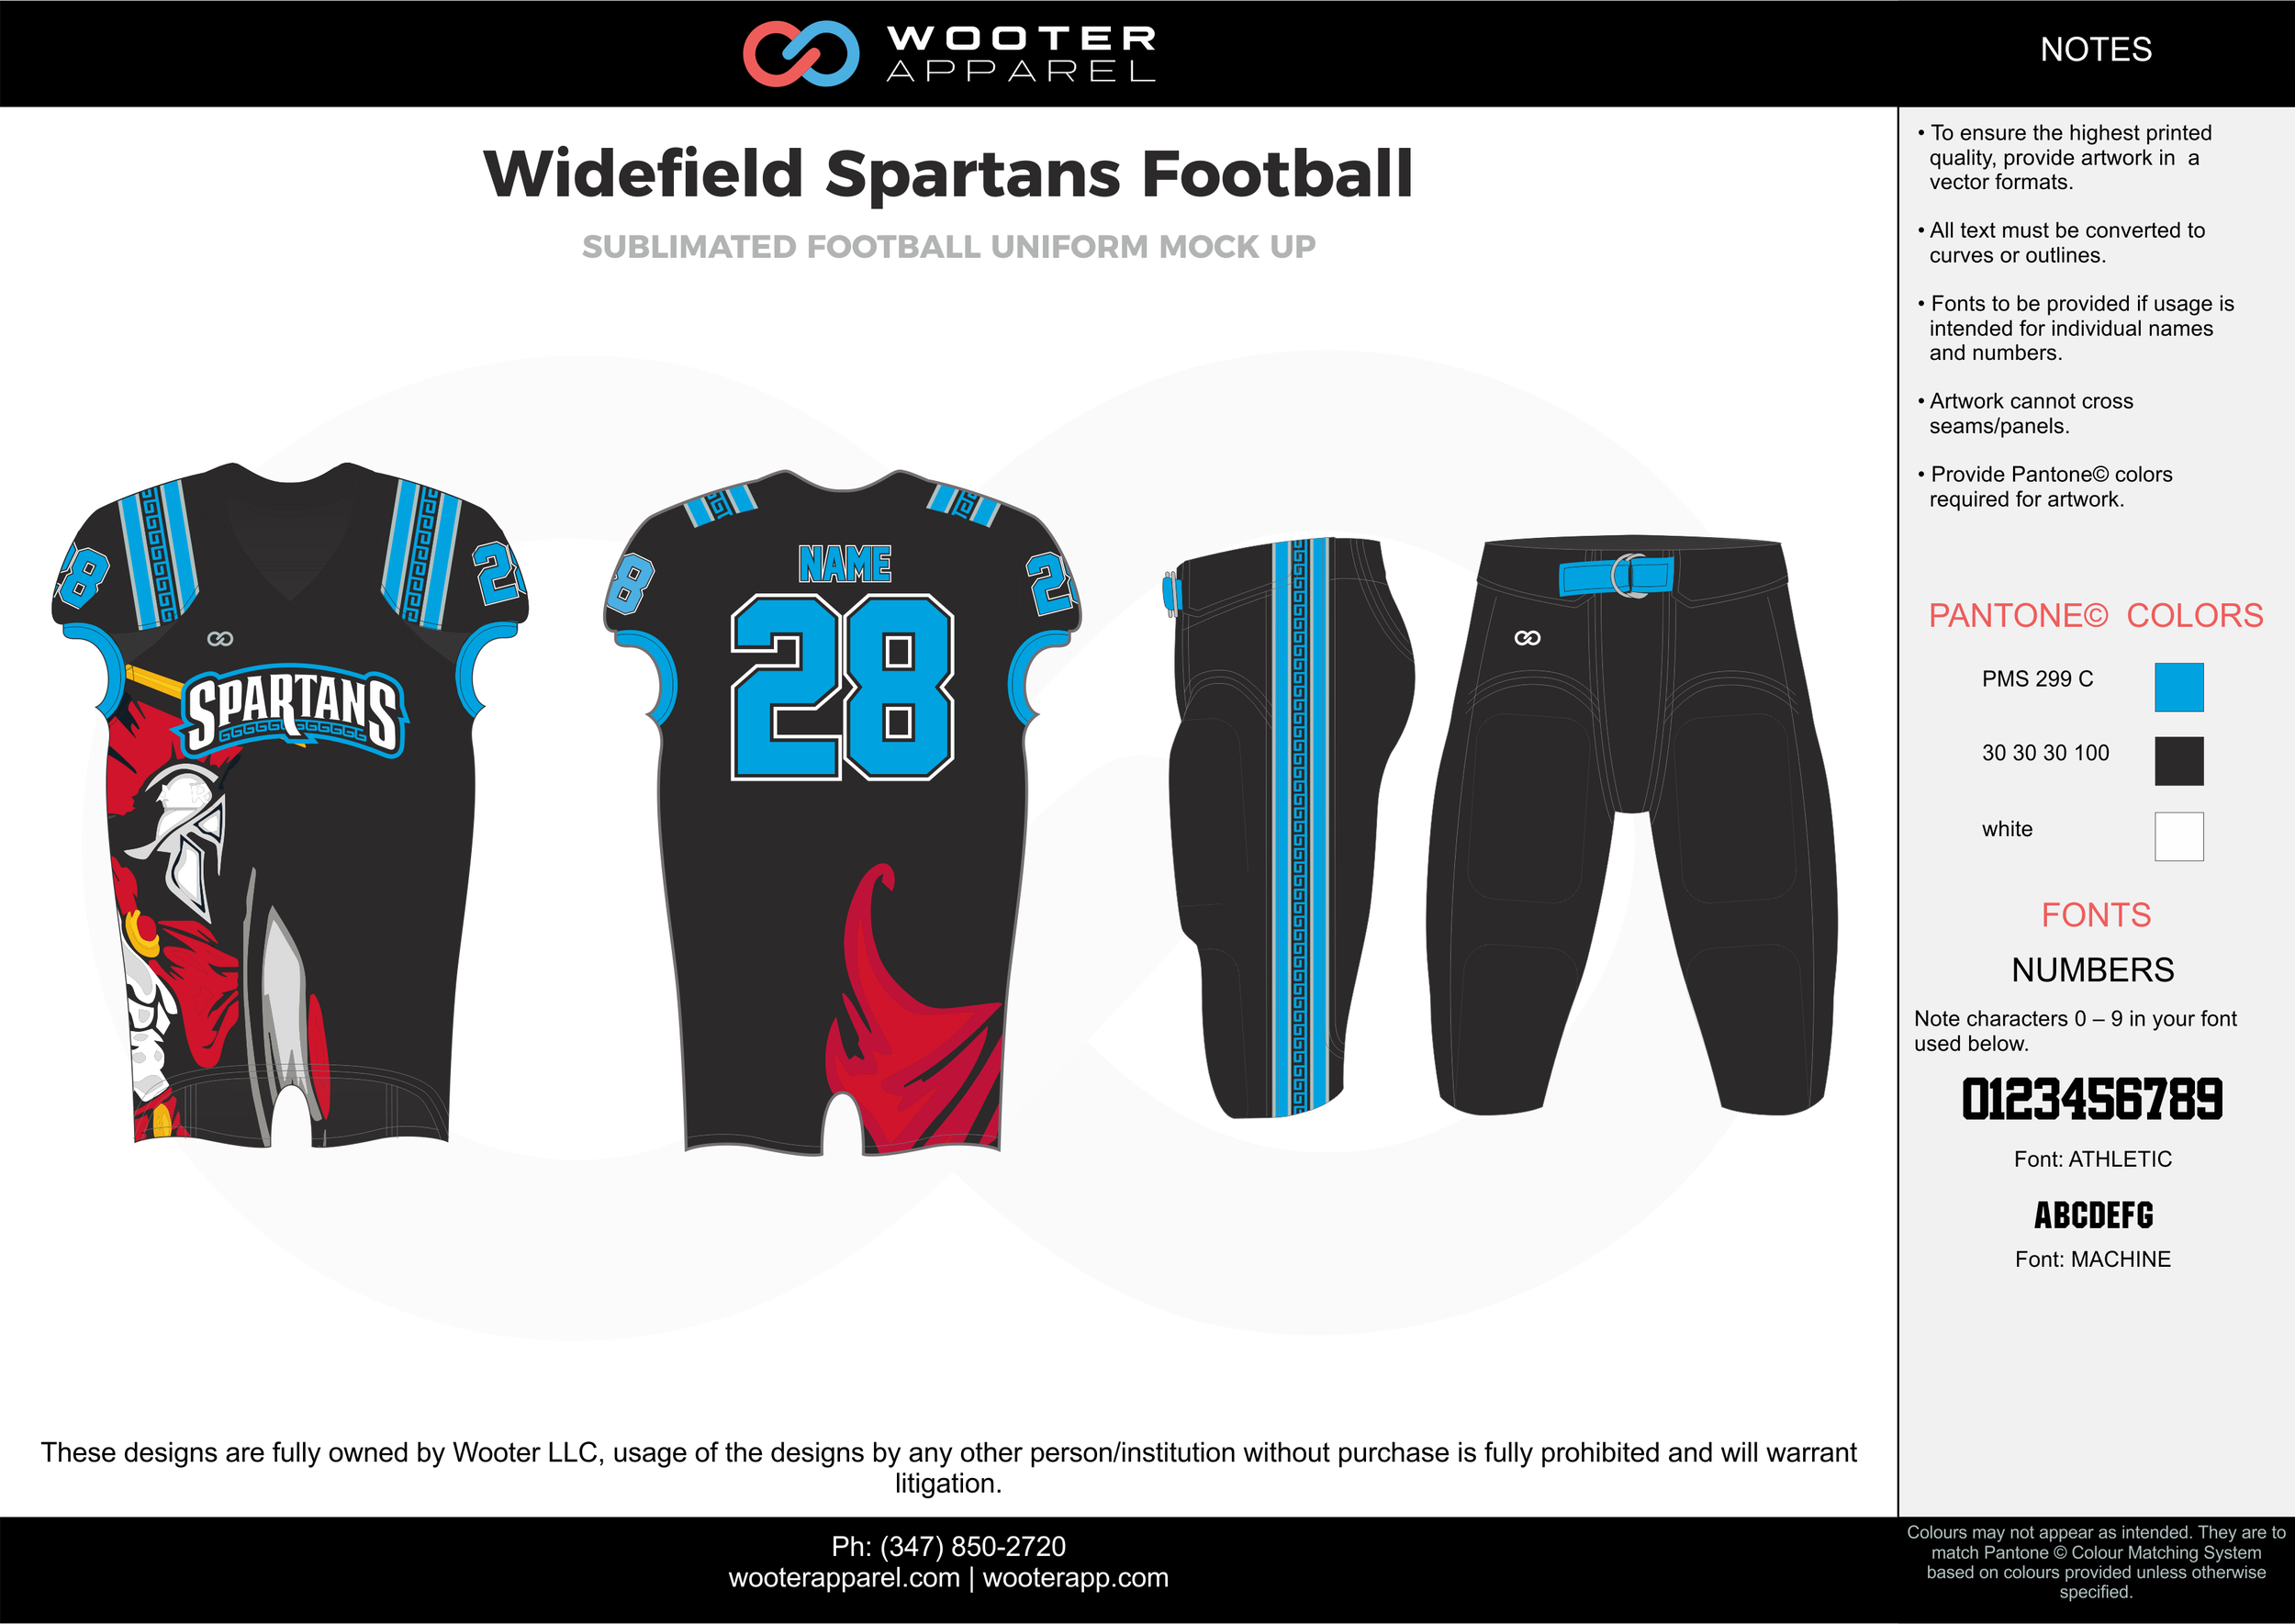 Widefield Spartans Football blue black red football uniforms jerseys pants